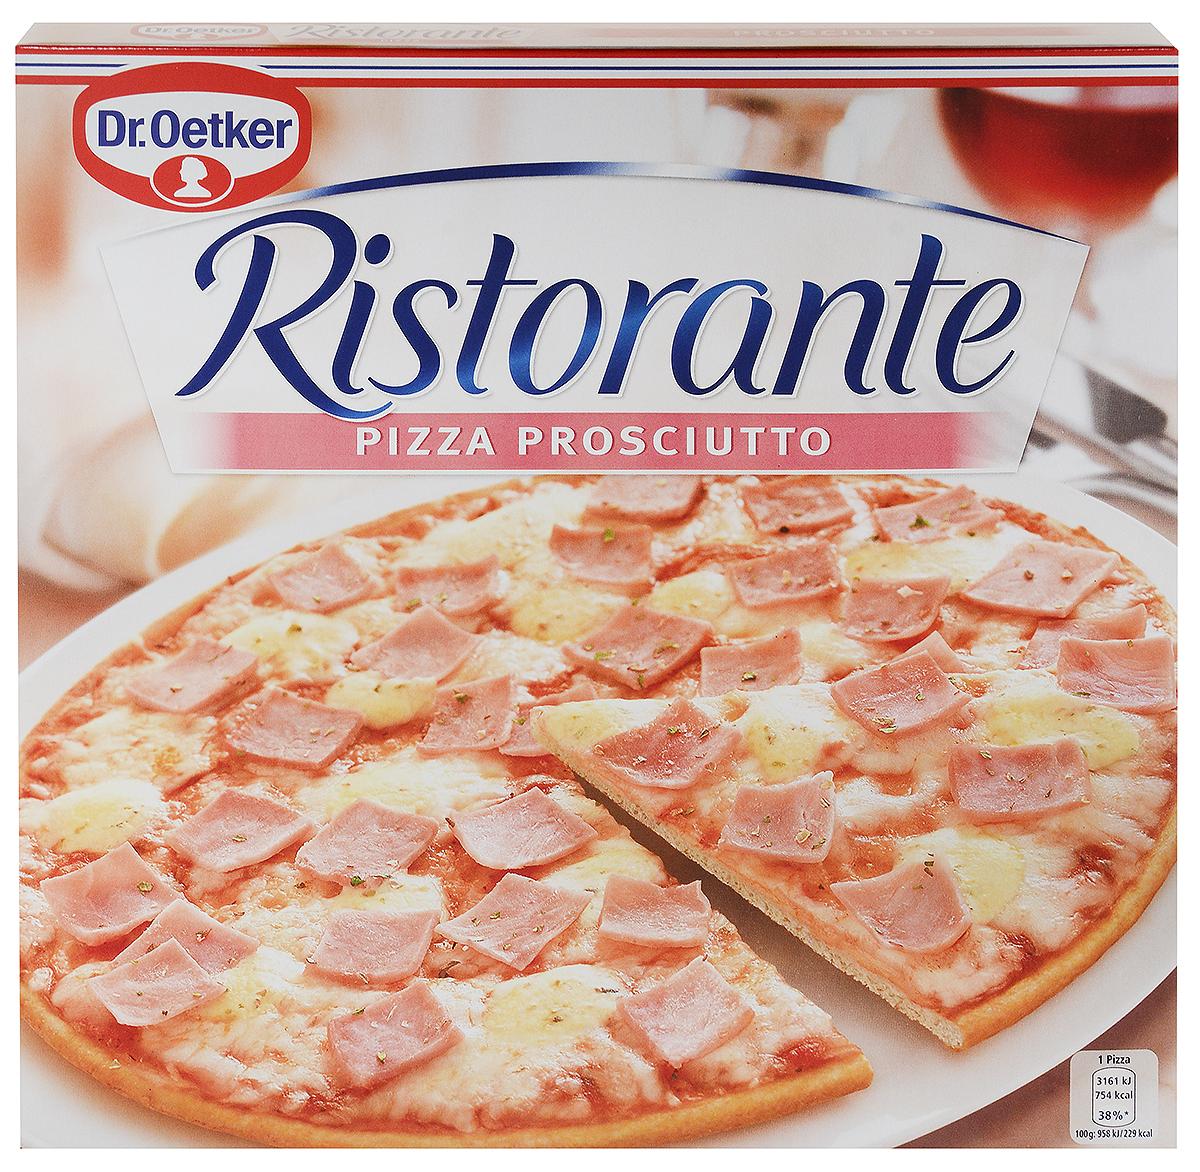 Dr.Oetker Пицца Ristorante Ветчина, 330 г цена